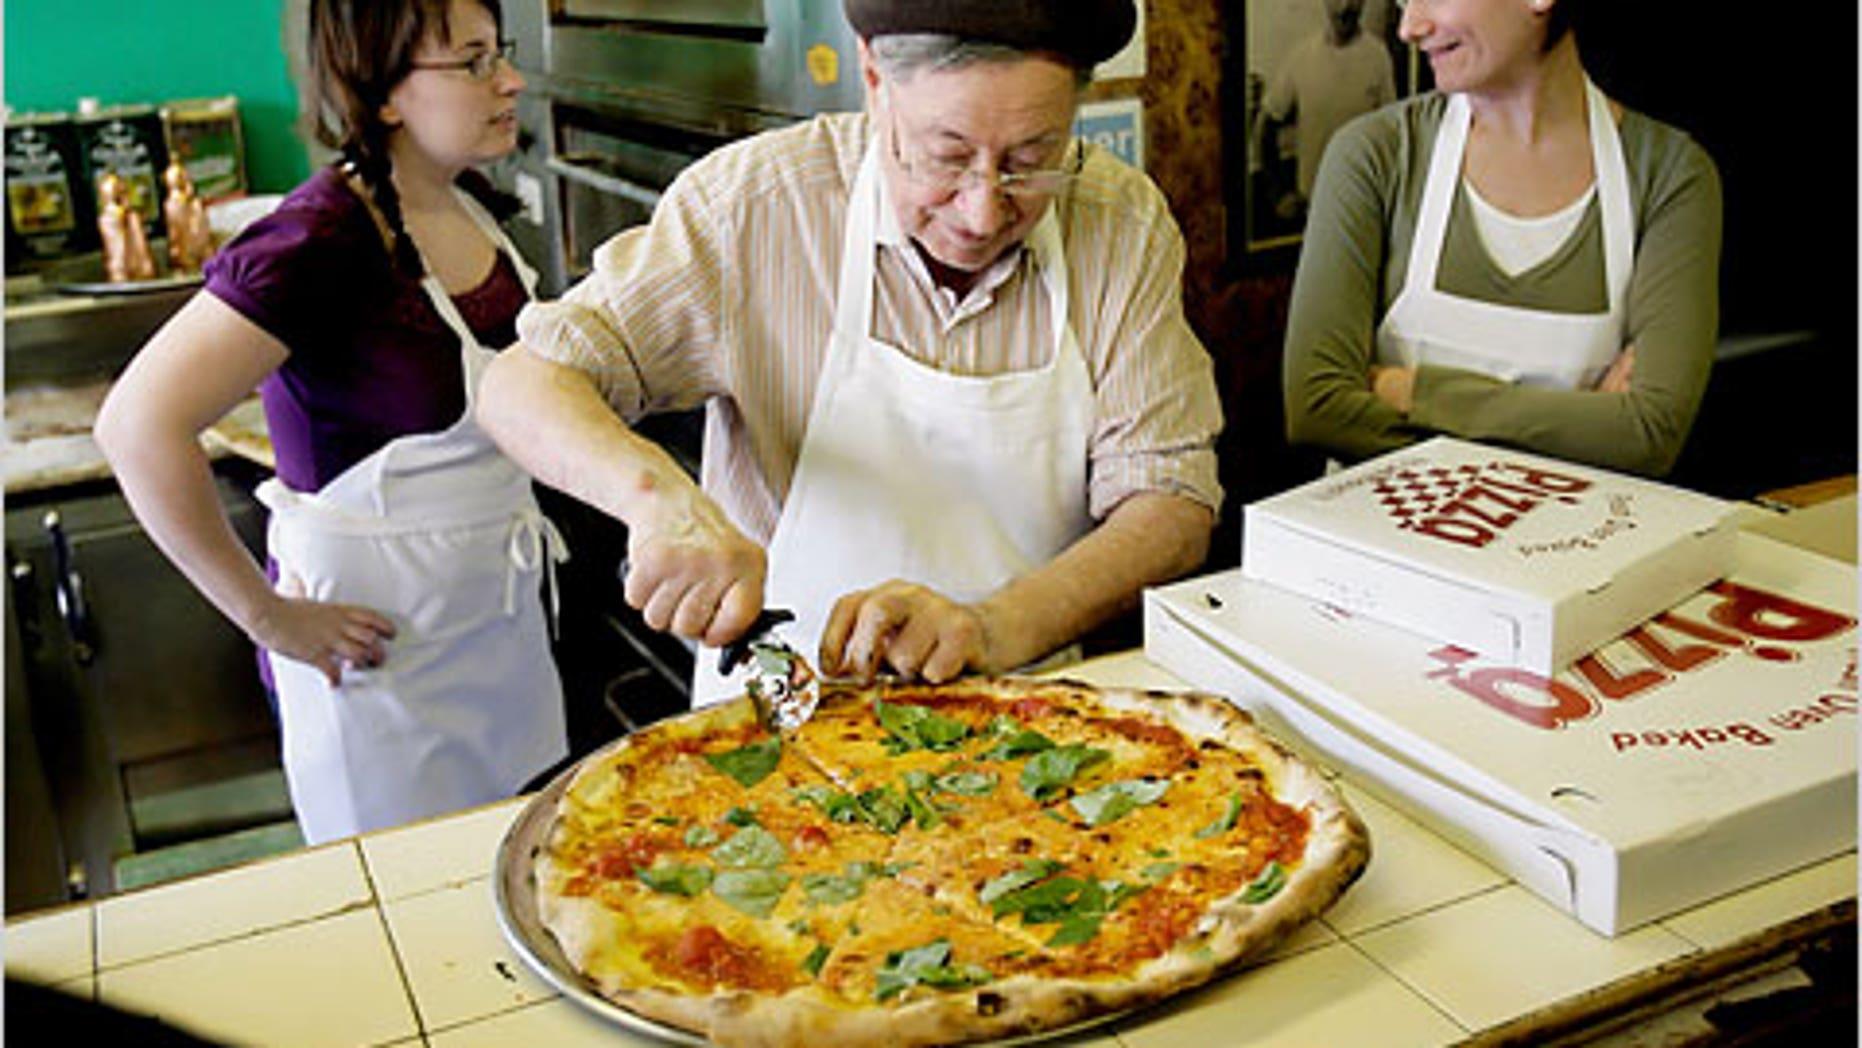 Di Fara pizzeria owner Dominico DeMarco slices one of his legendary pies.